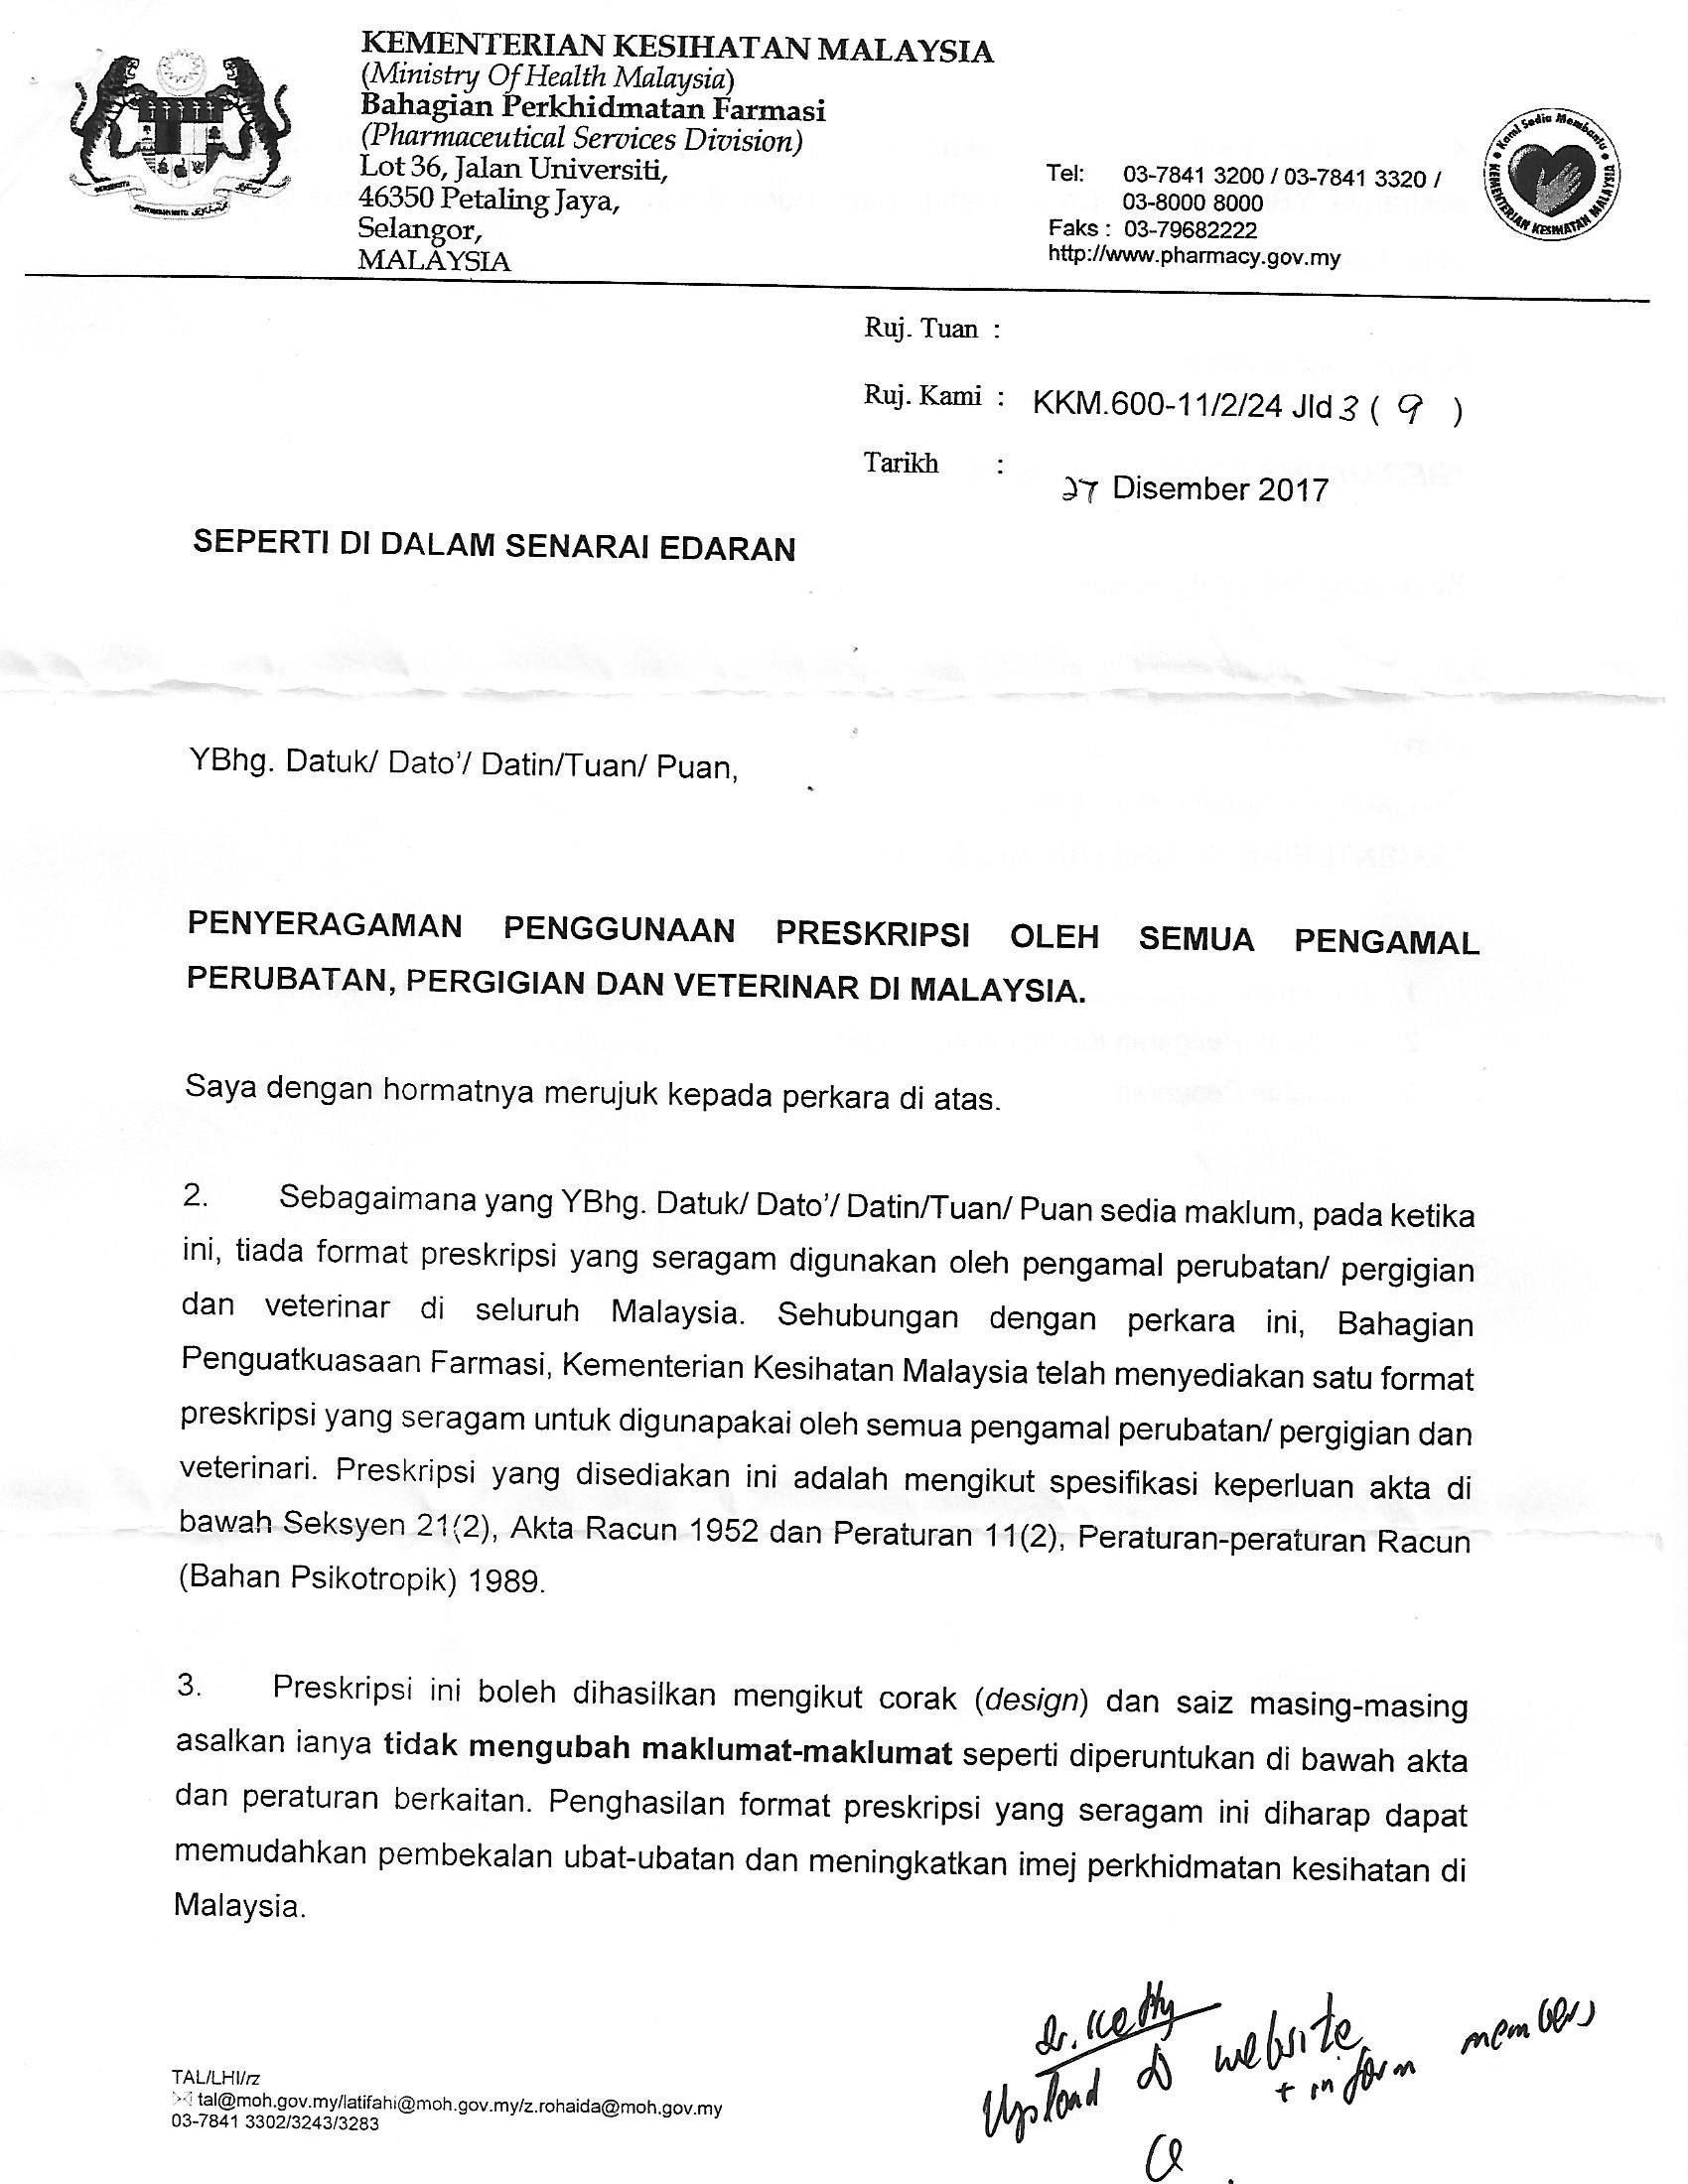 Veterinary Prescription Form – MSAVA